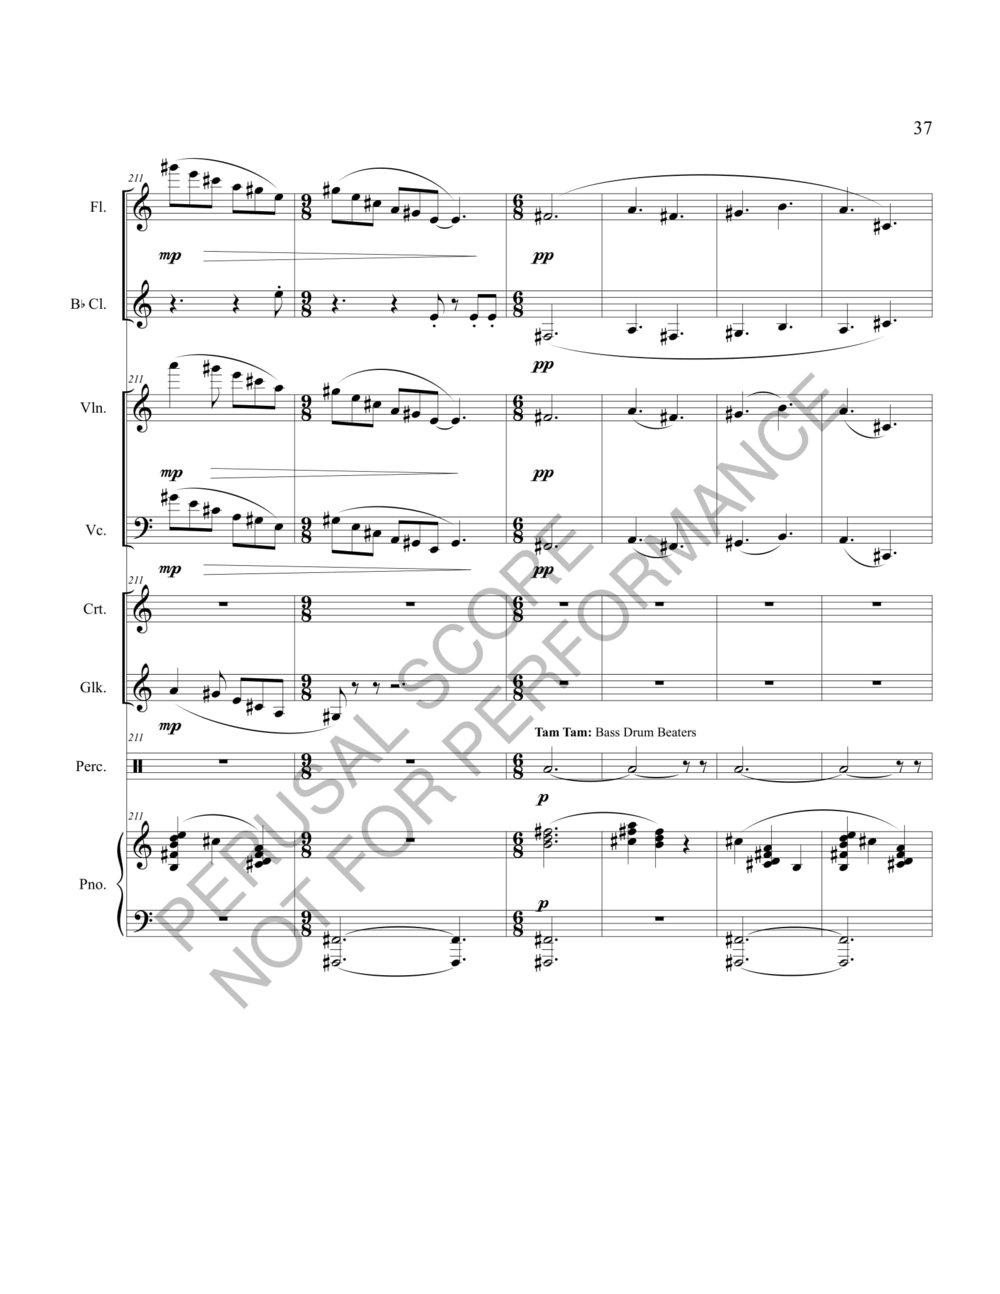 Boyd Terra Liberi Score-watermark-43.jpg